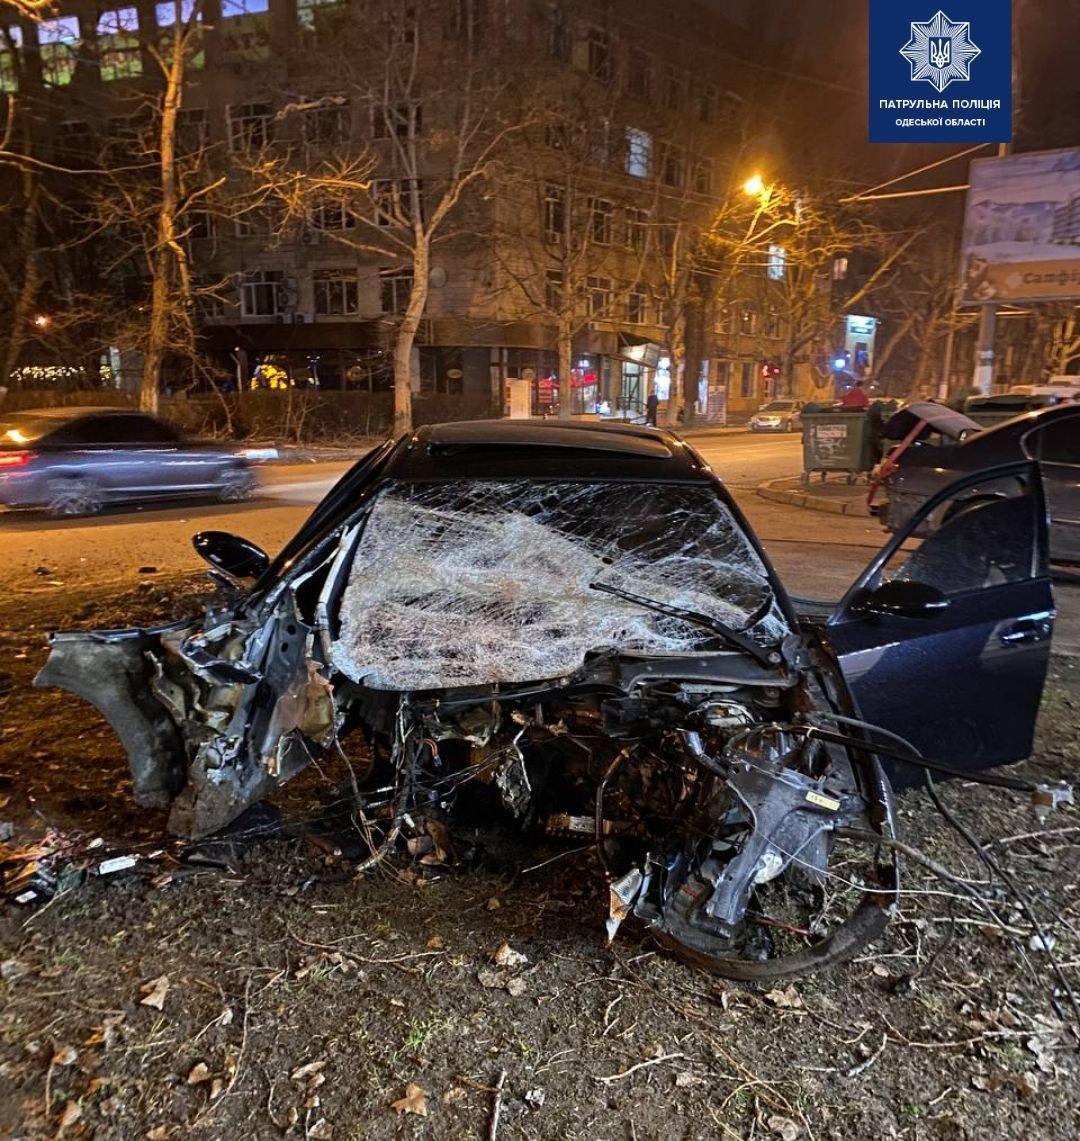 Жесткое ДТП в Одессе: от удара взорвался автомобиль, ФОТО, фото-1